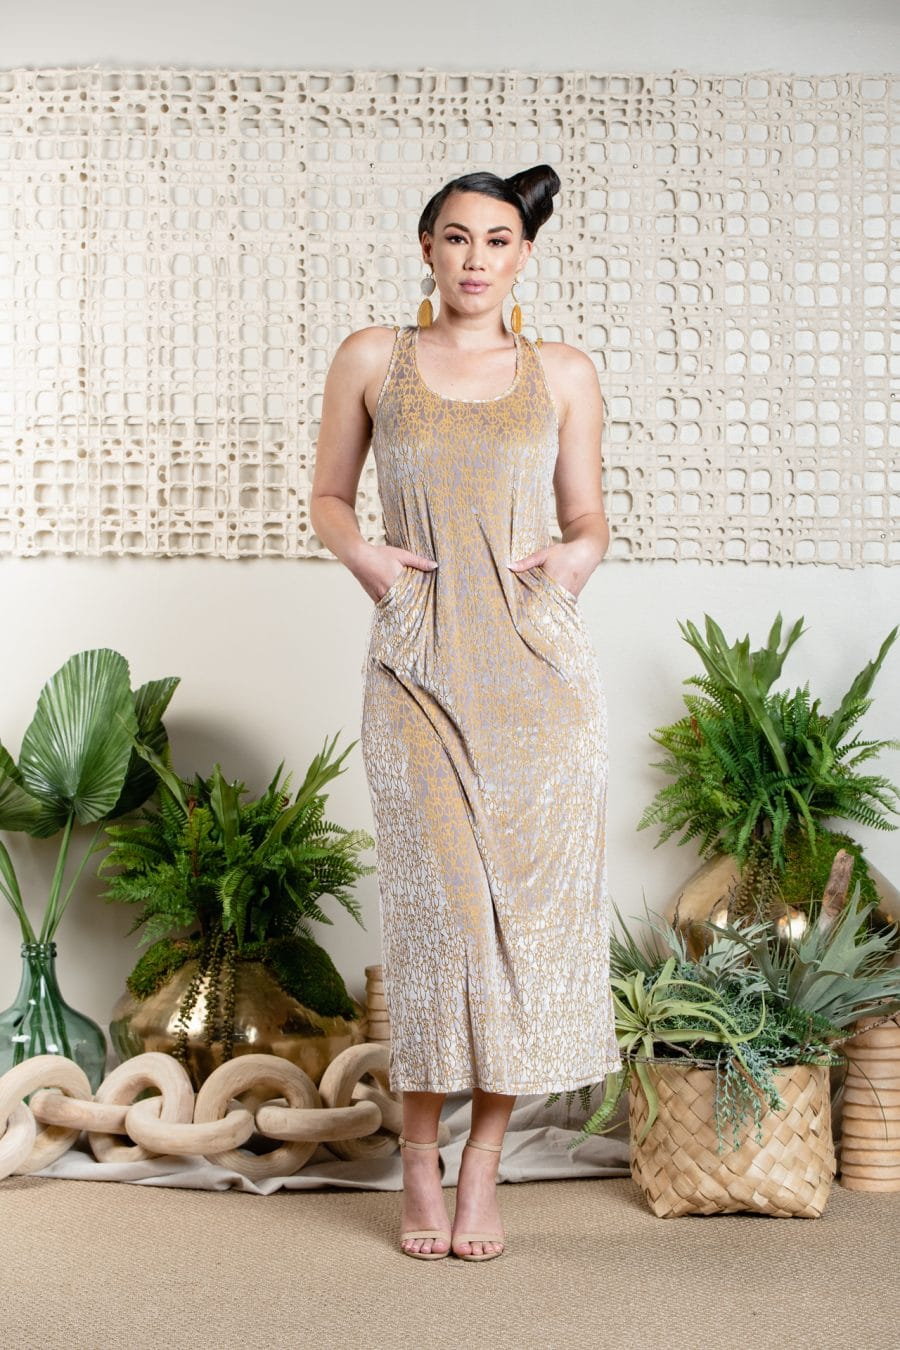 Model wearing KEAHI ENAENA - Front View